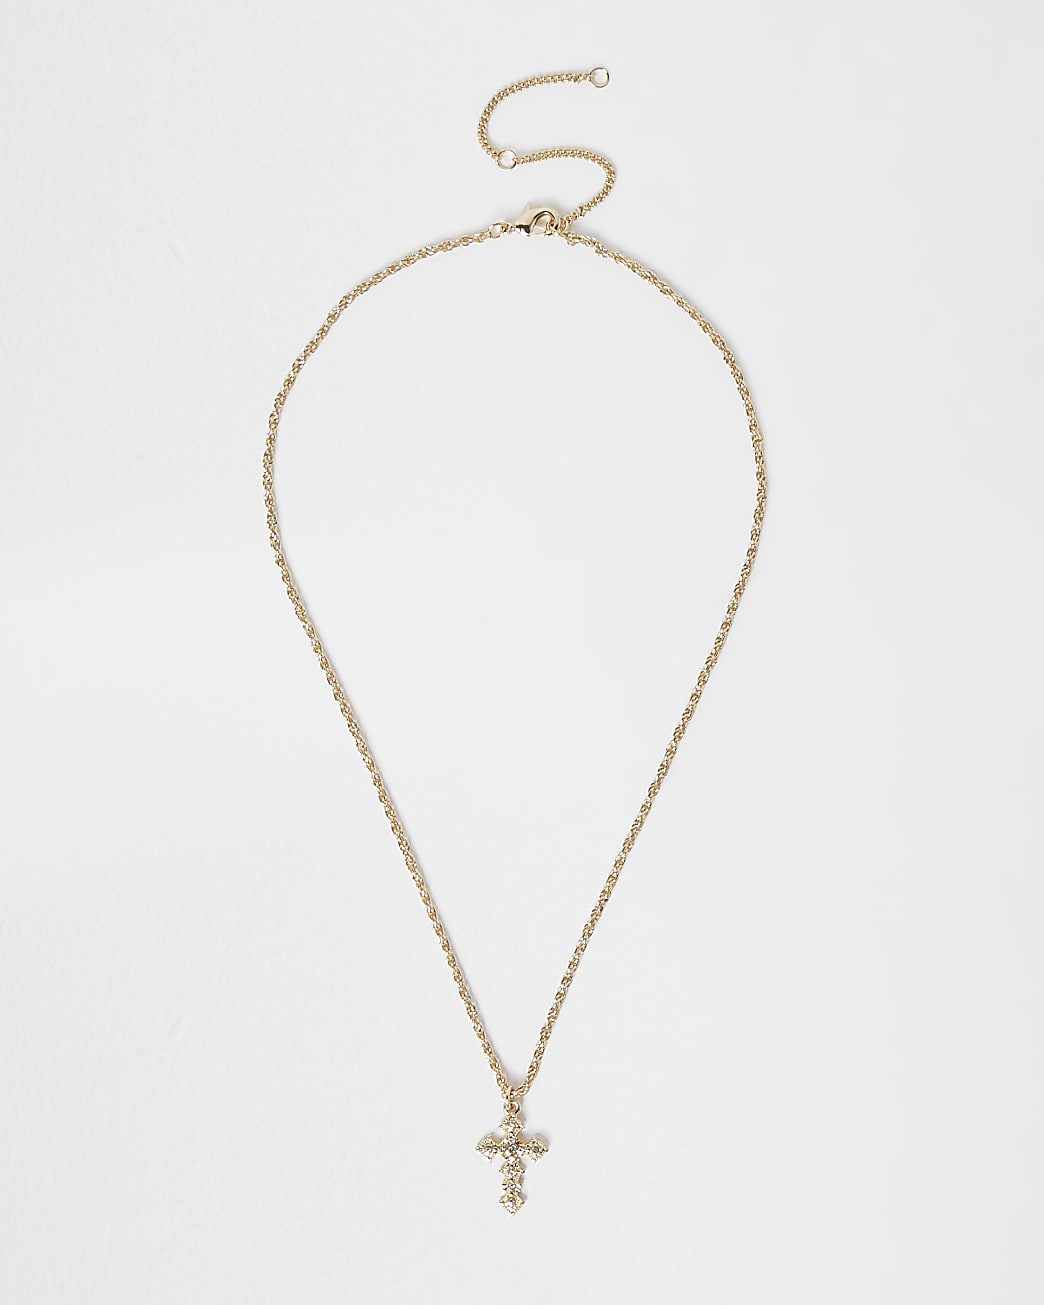 Gold rhinestone cross necklace